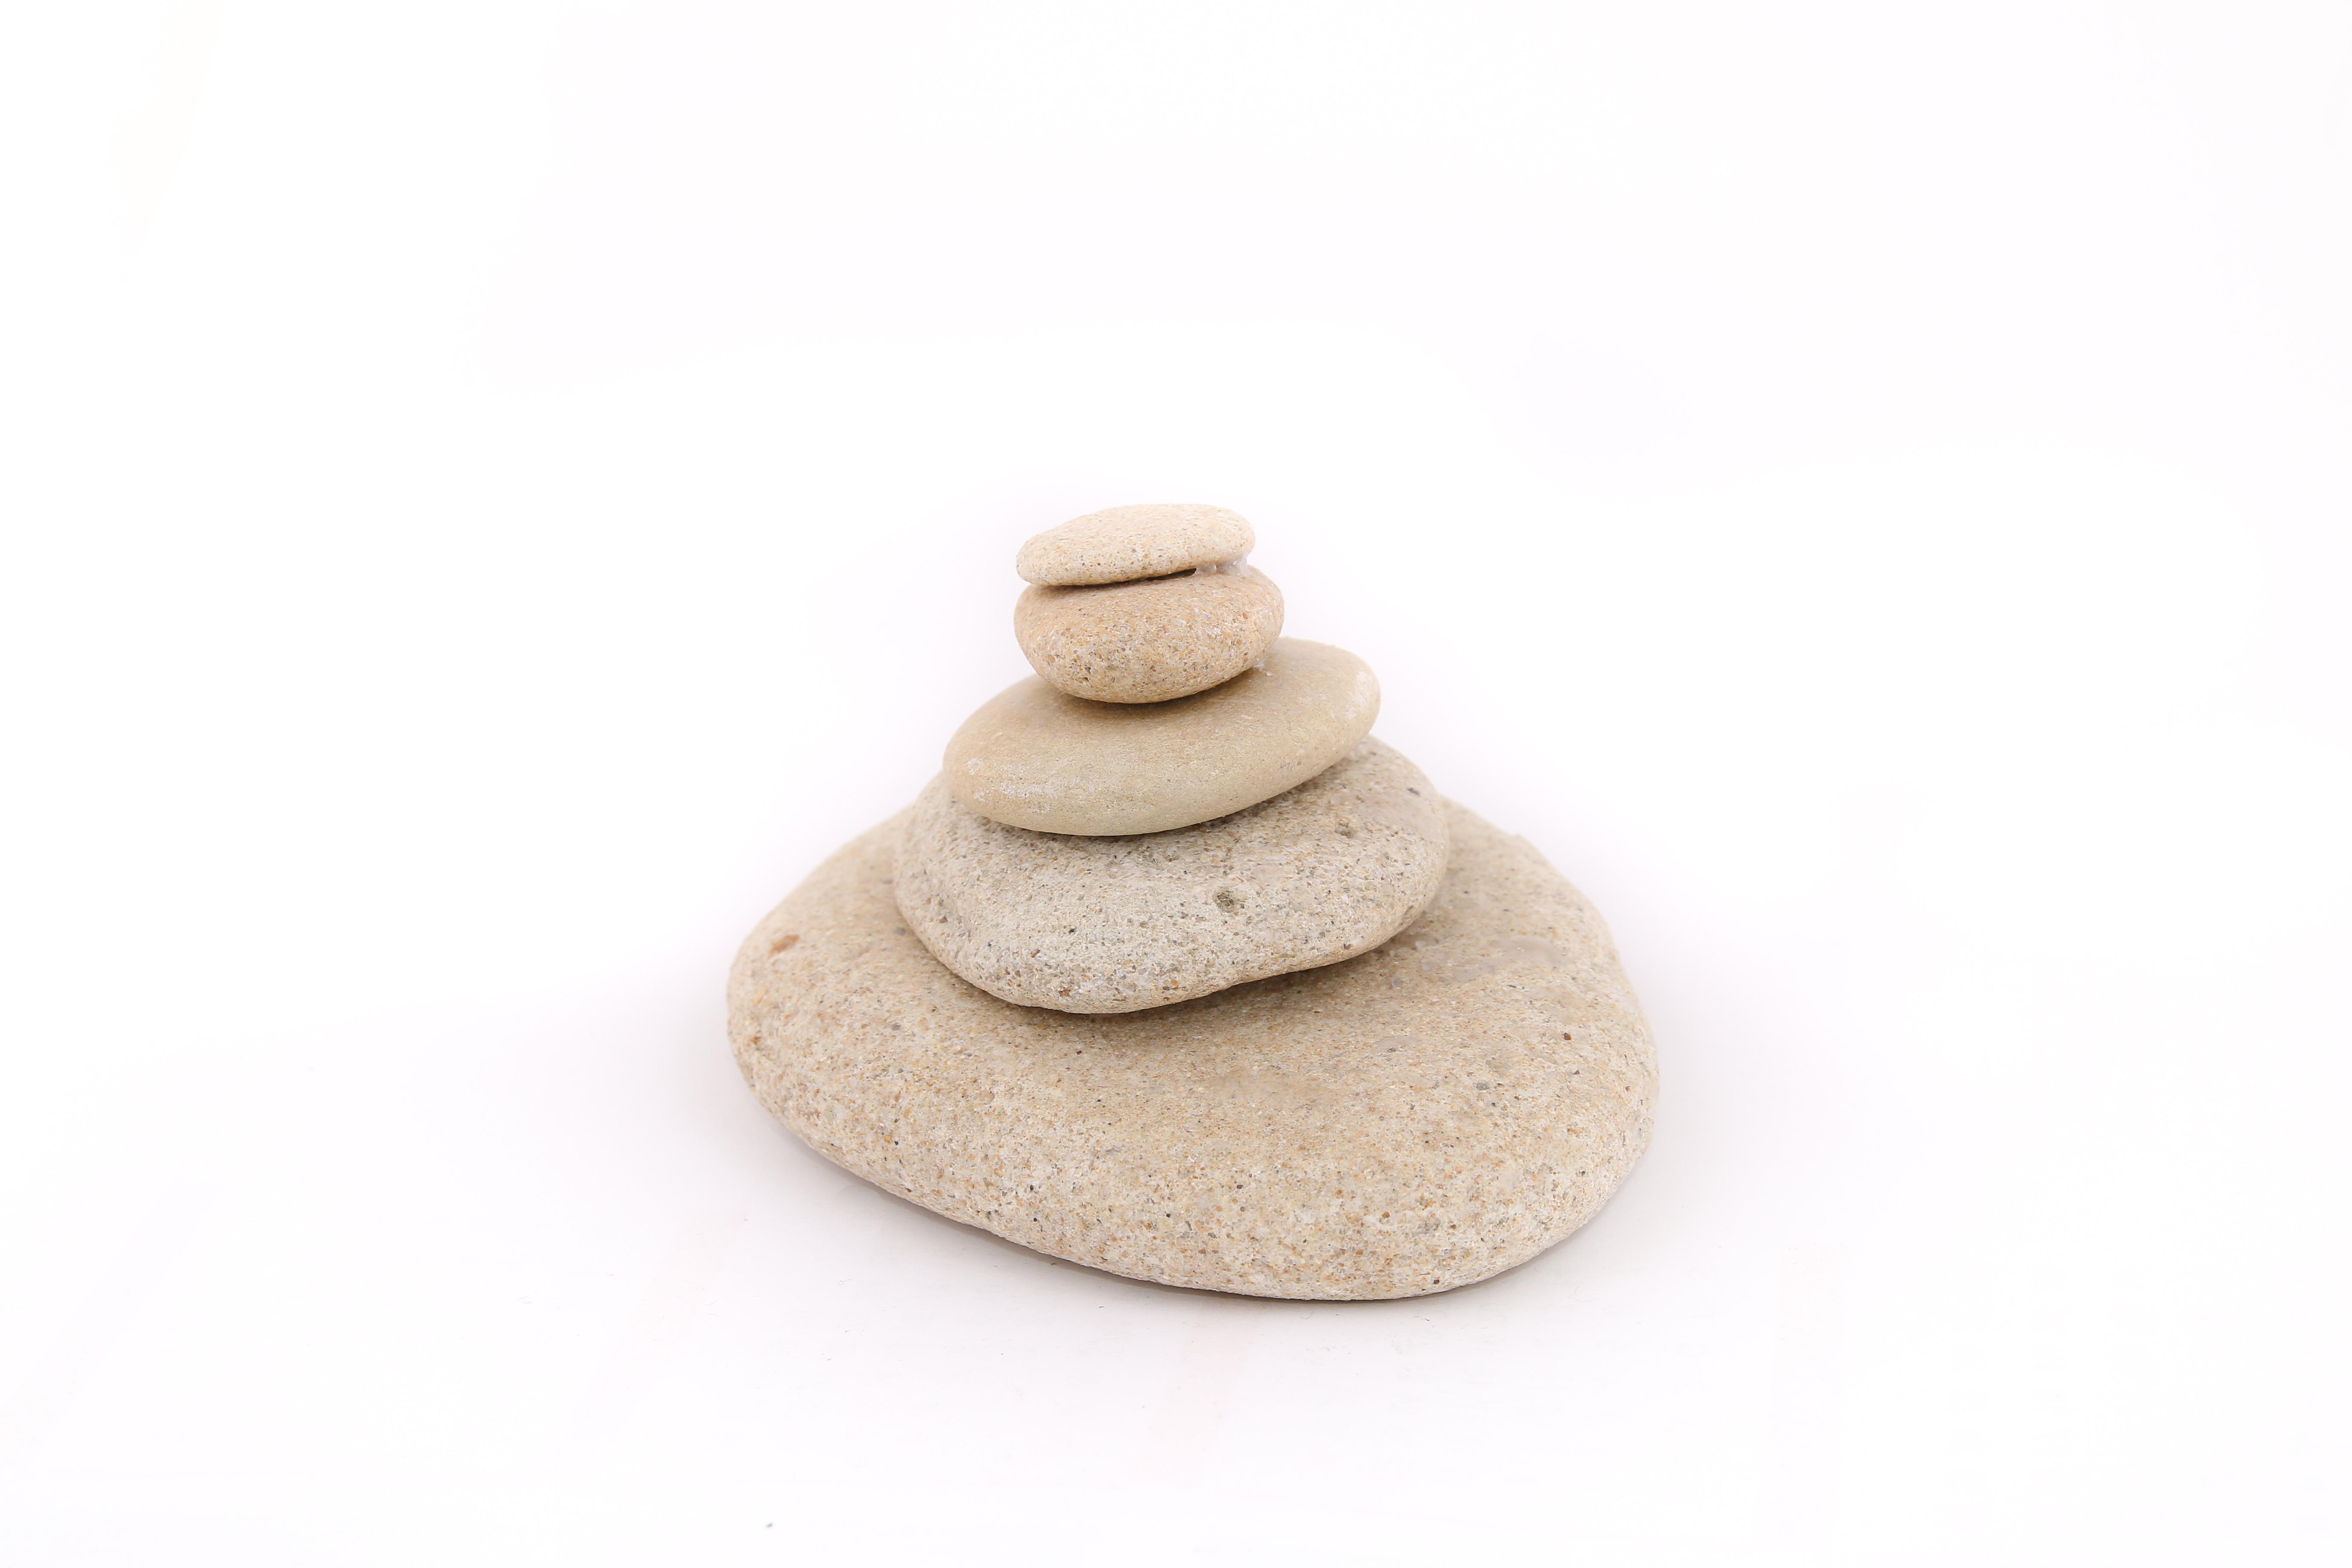 Fotos gratis piedra cer mico apilar juguete material for Fotos piedras zen